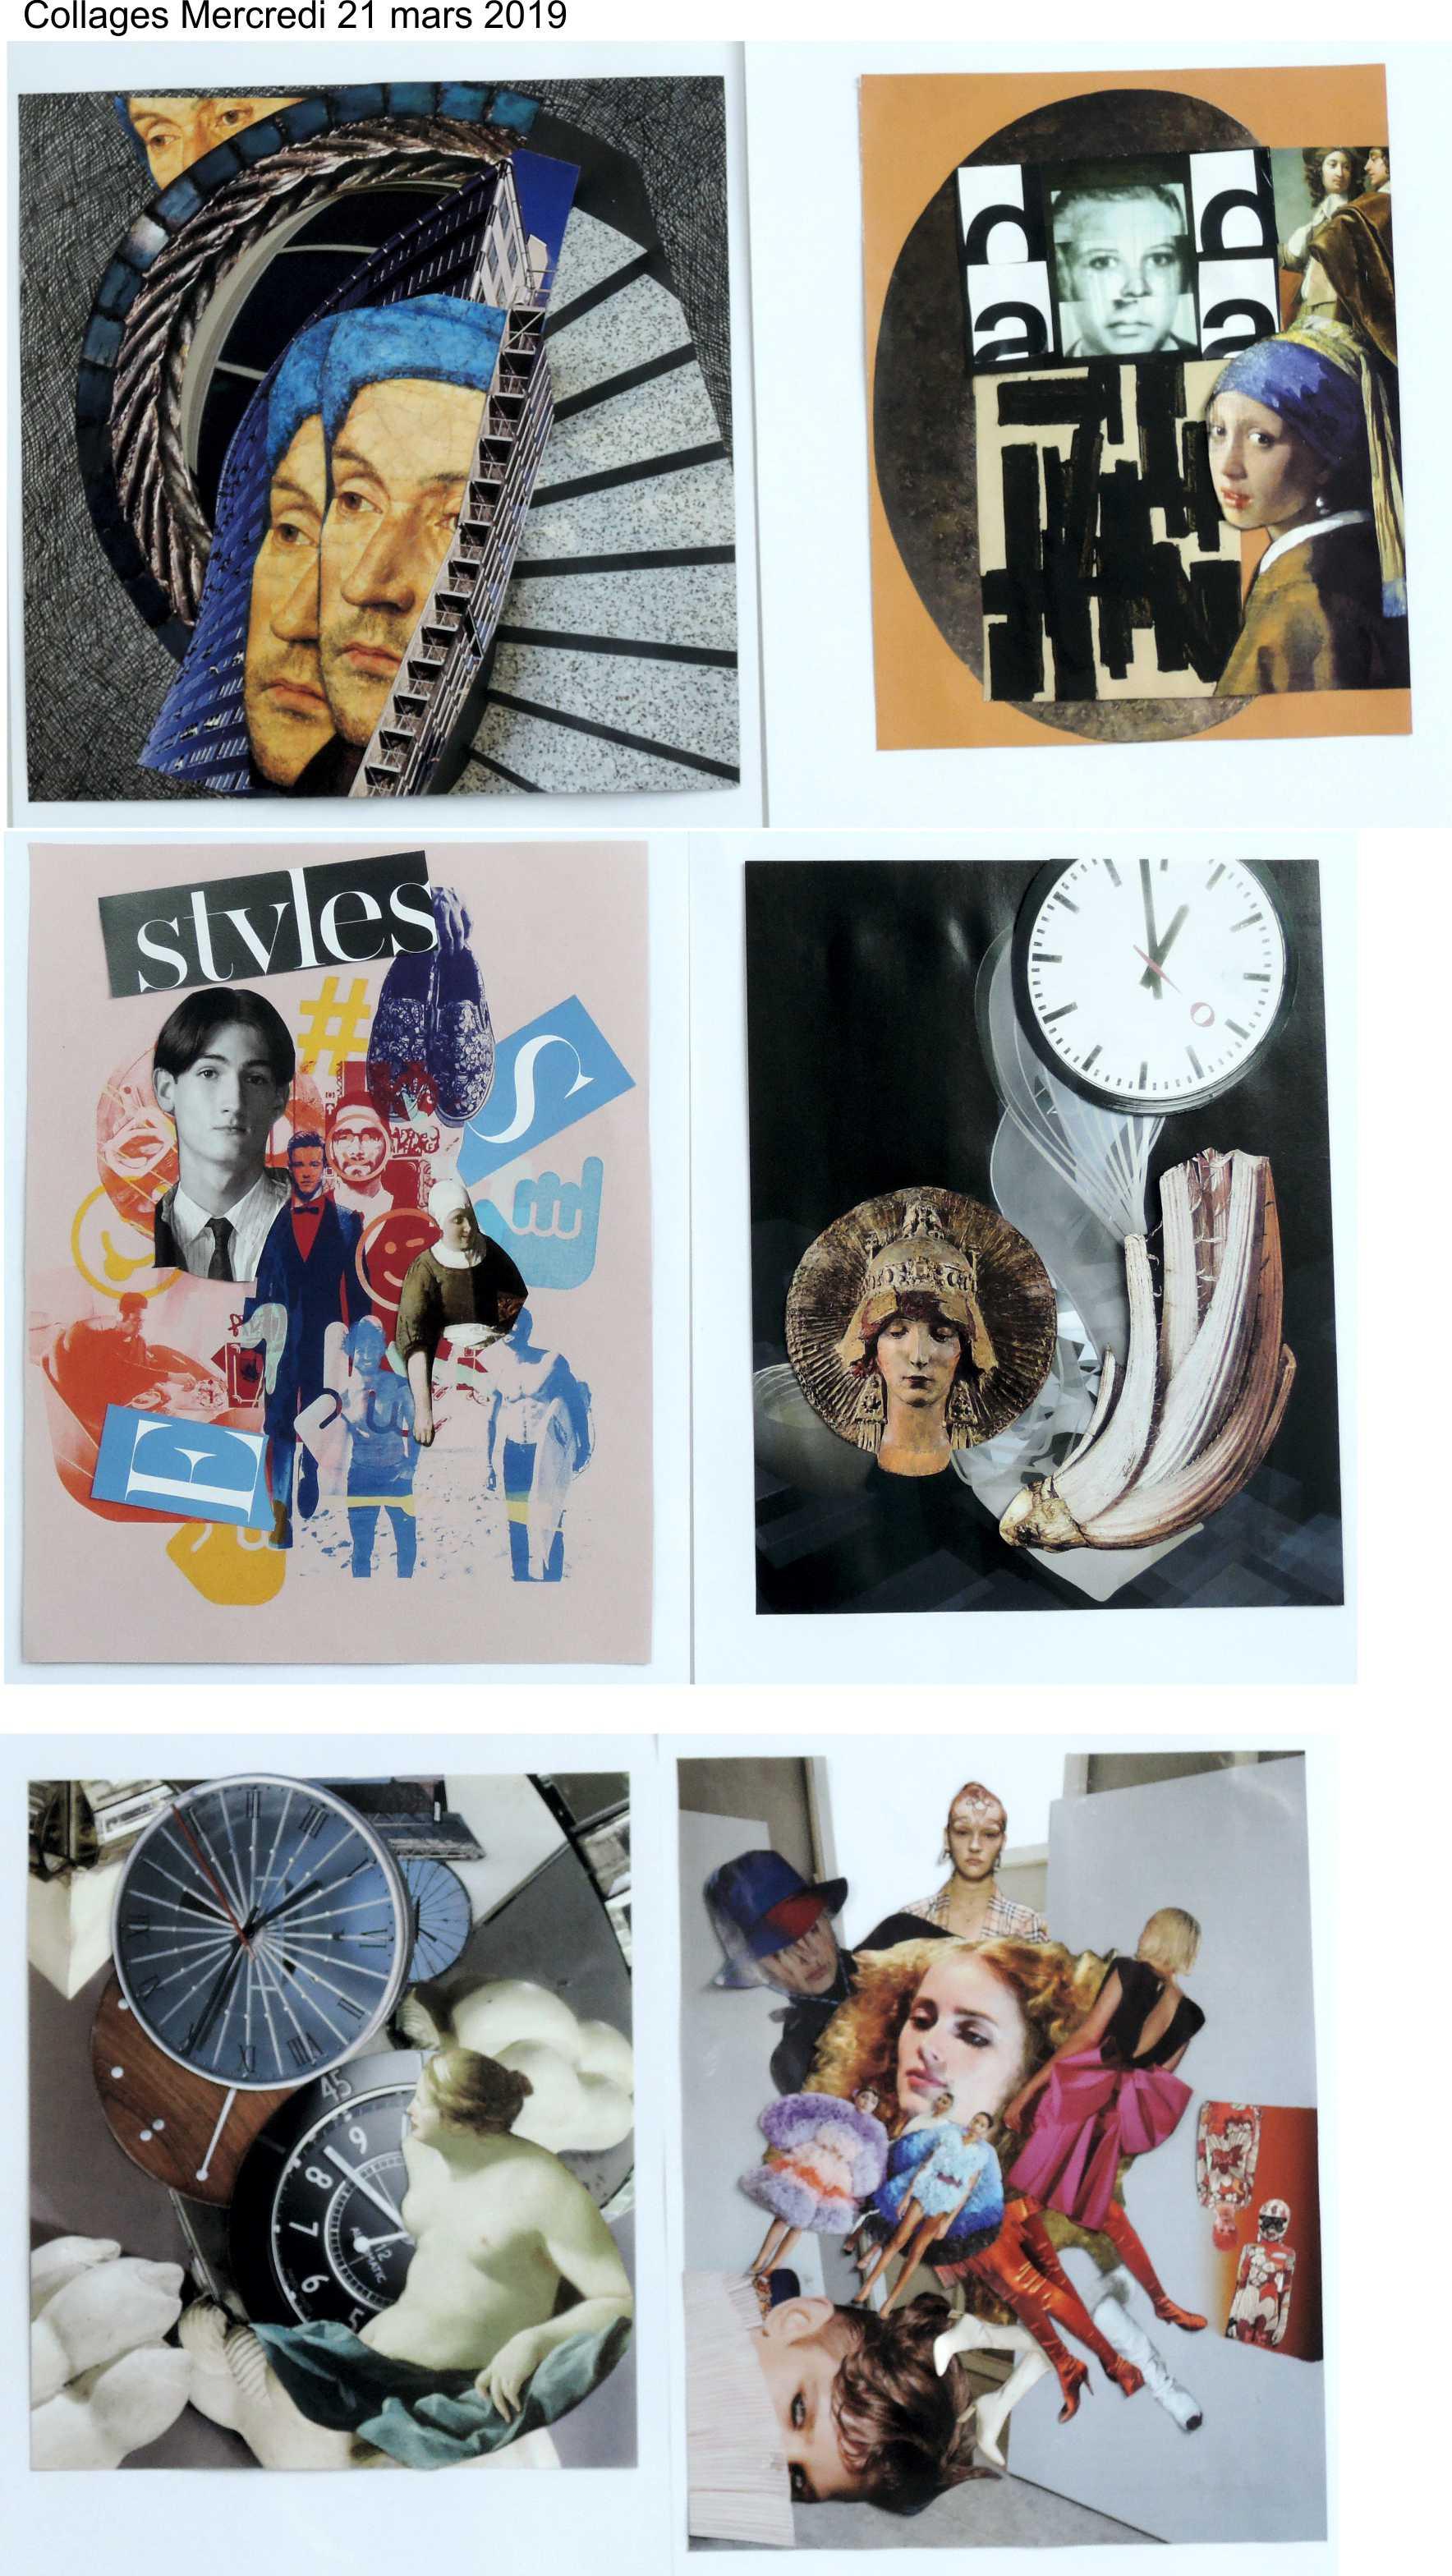 Collages jeudi 21 mars Raoul Hausmann 1